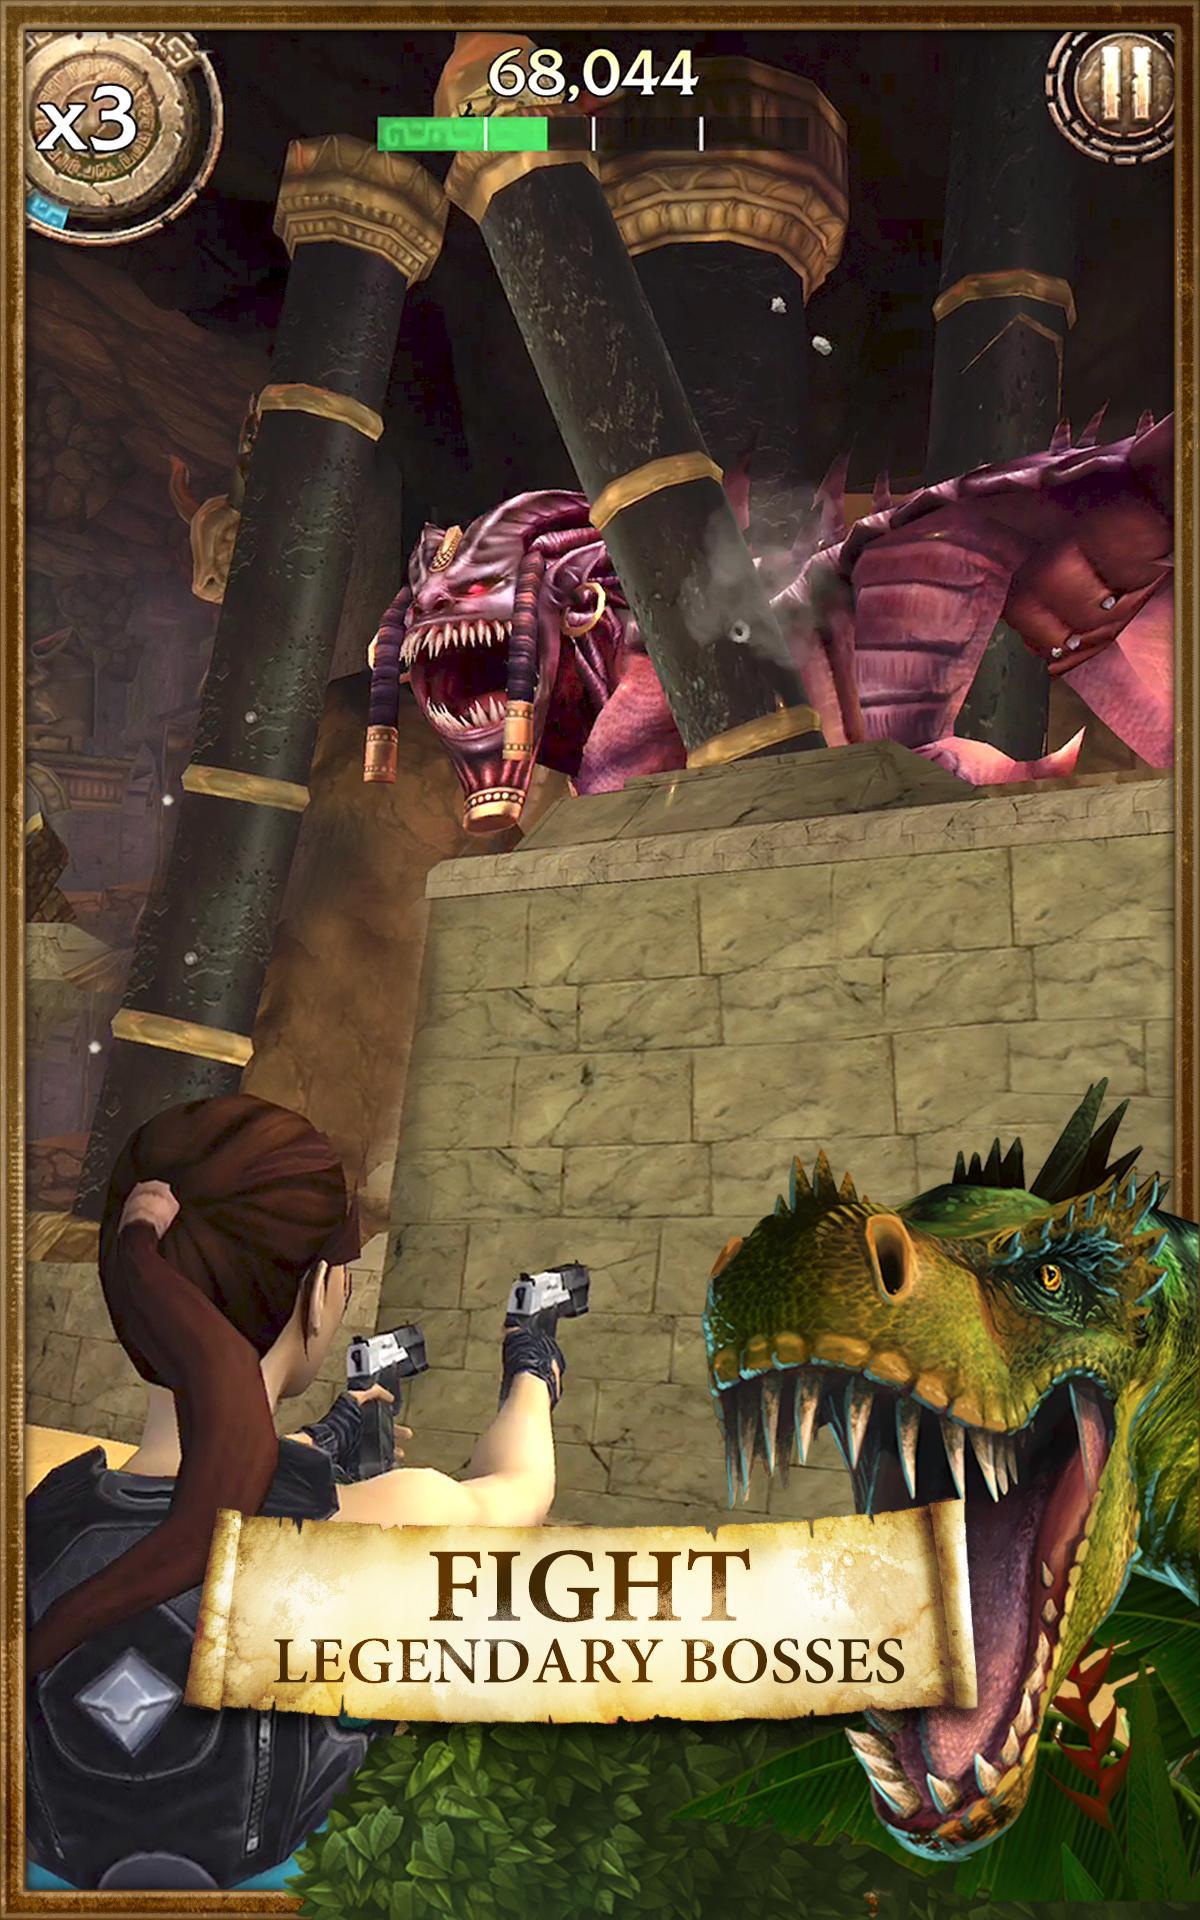 Lara Croft: Relic Run 1.11.112 Screenshot 16